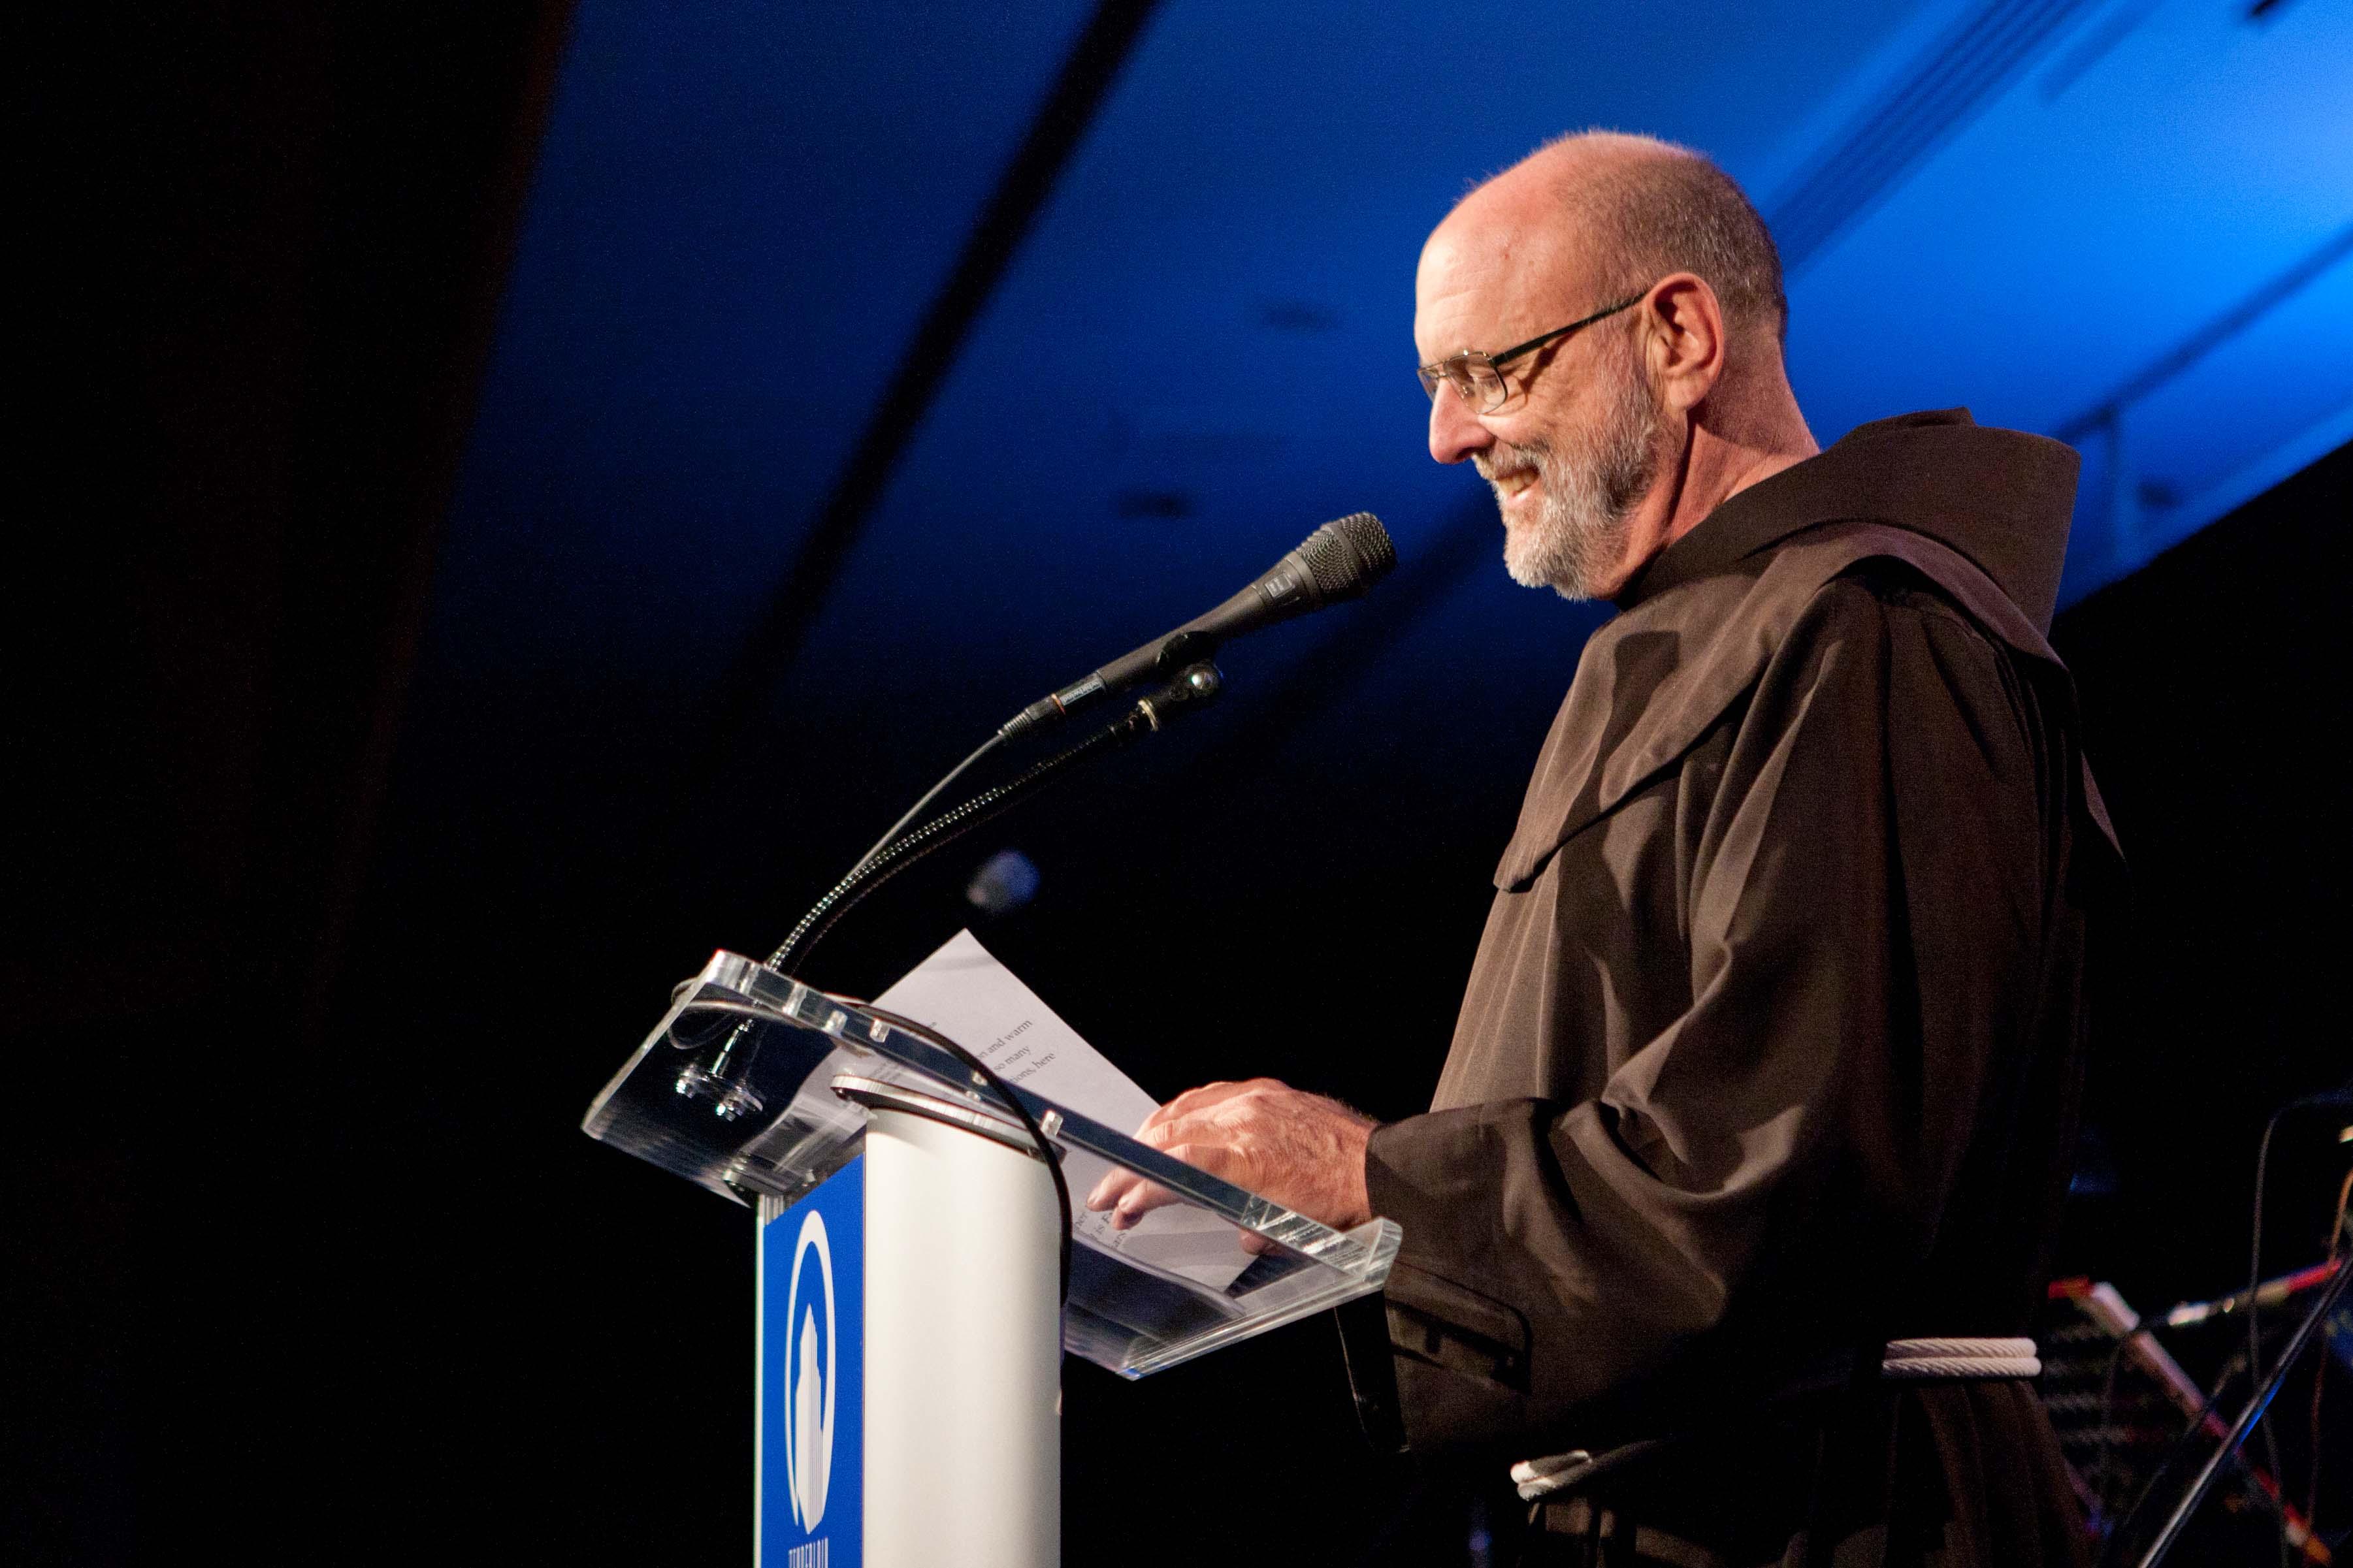 Fr. John Hardin